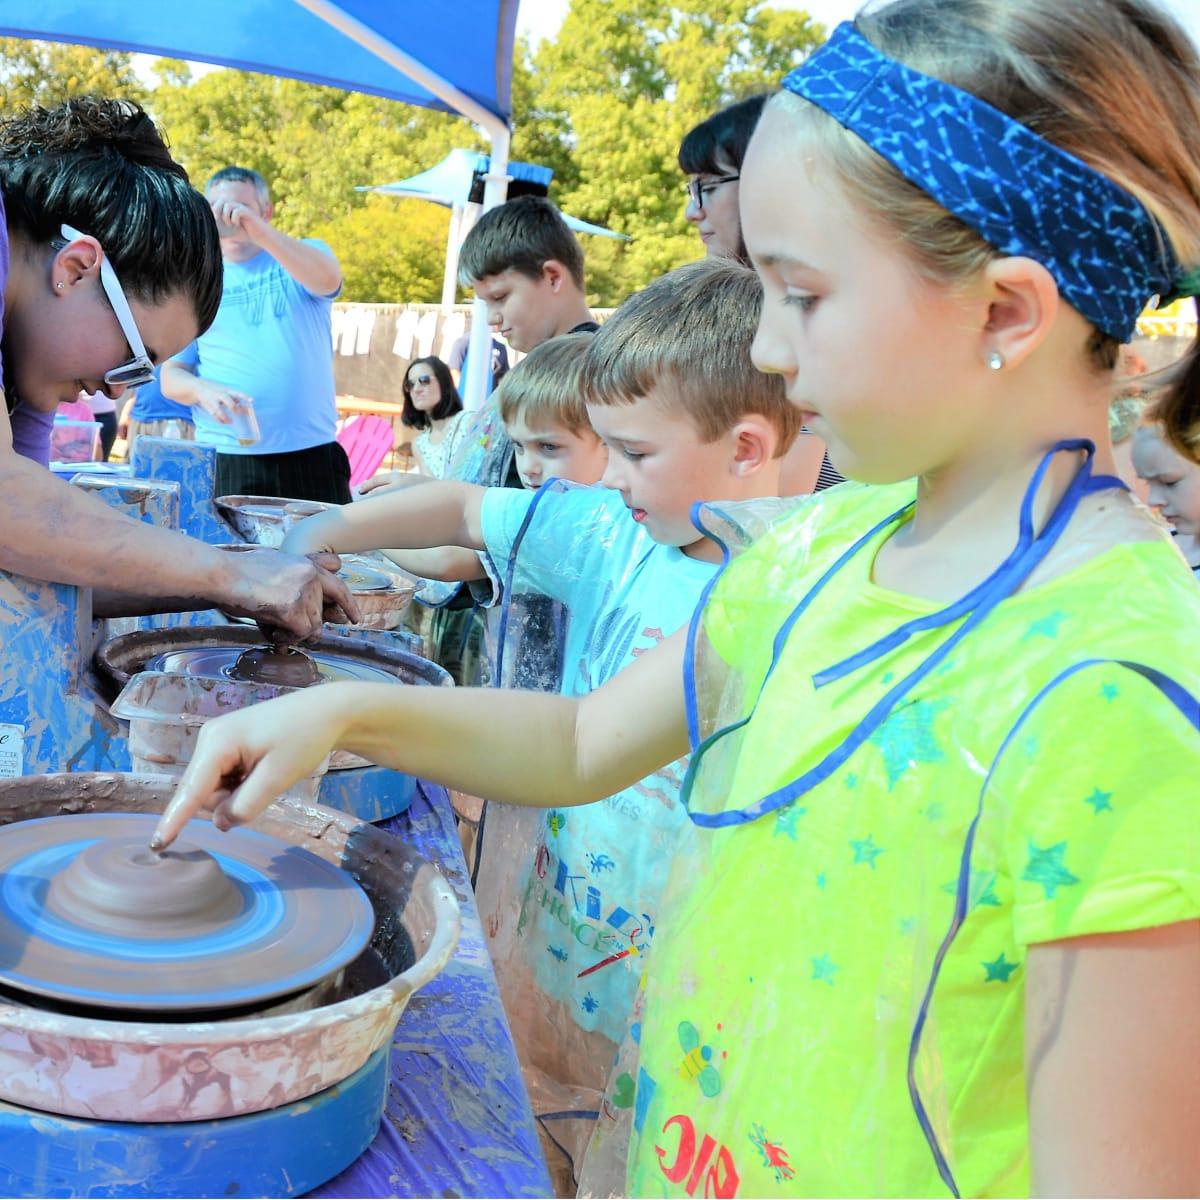 Children making pottery at Cottonwood Art Festival